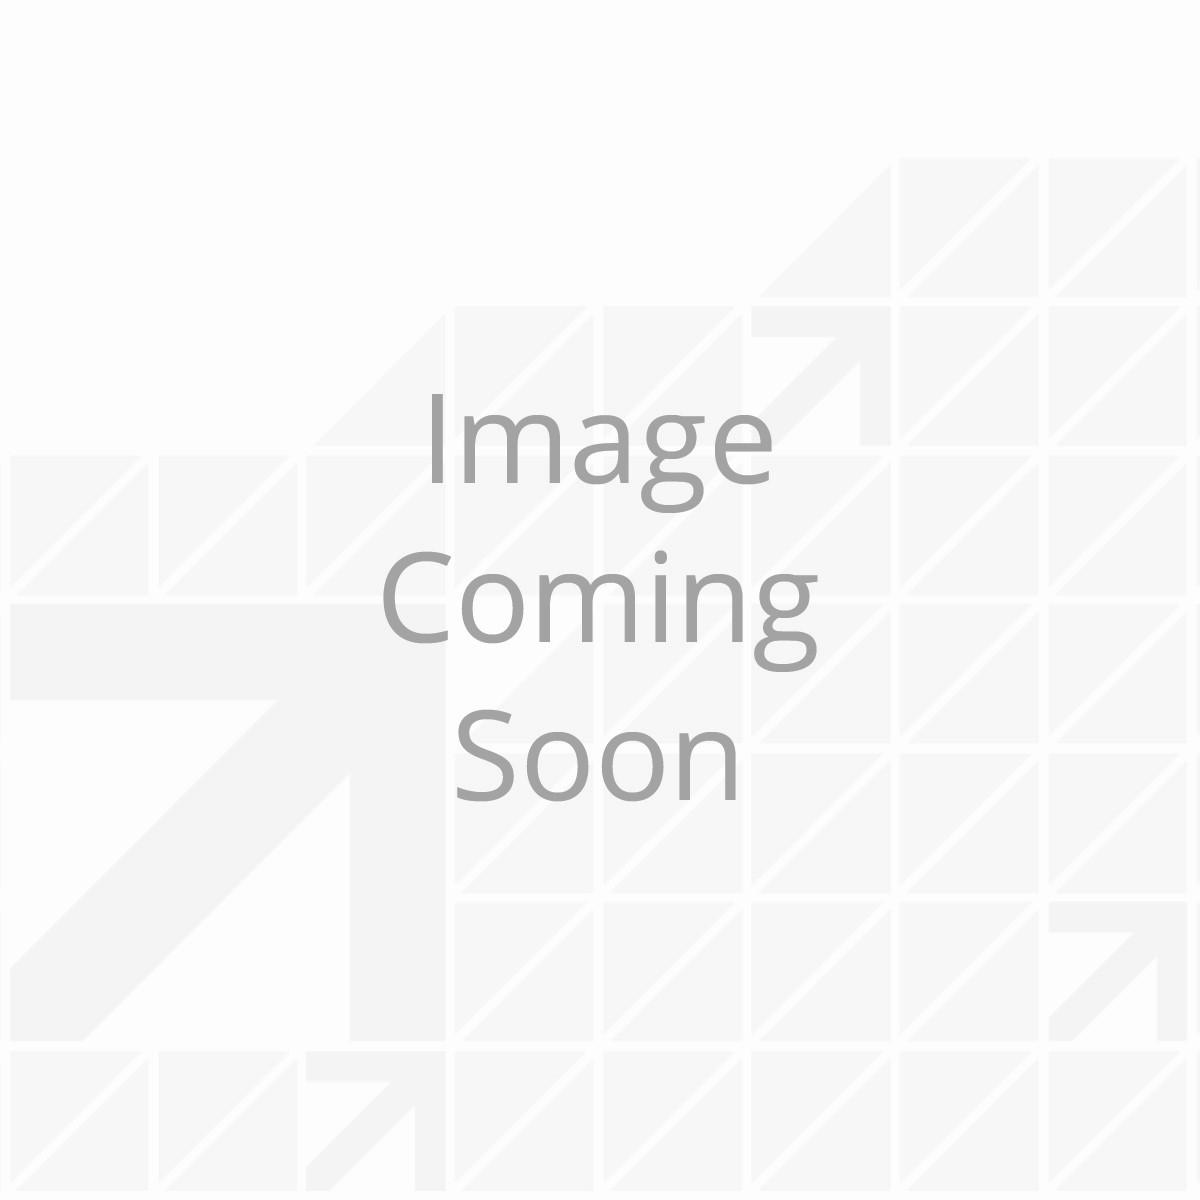 SecureLatch Channel-Style Lunette Ring Hardware Kit